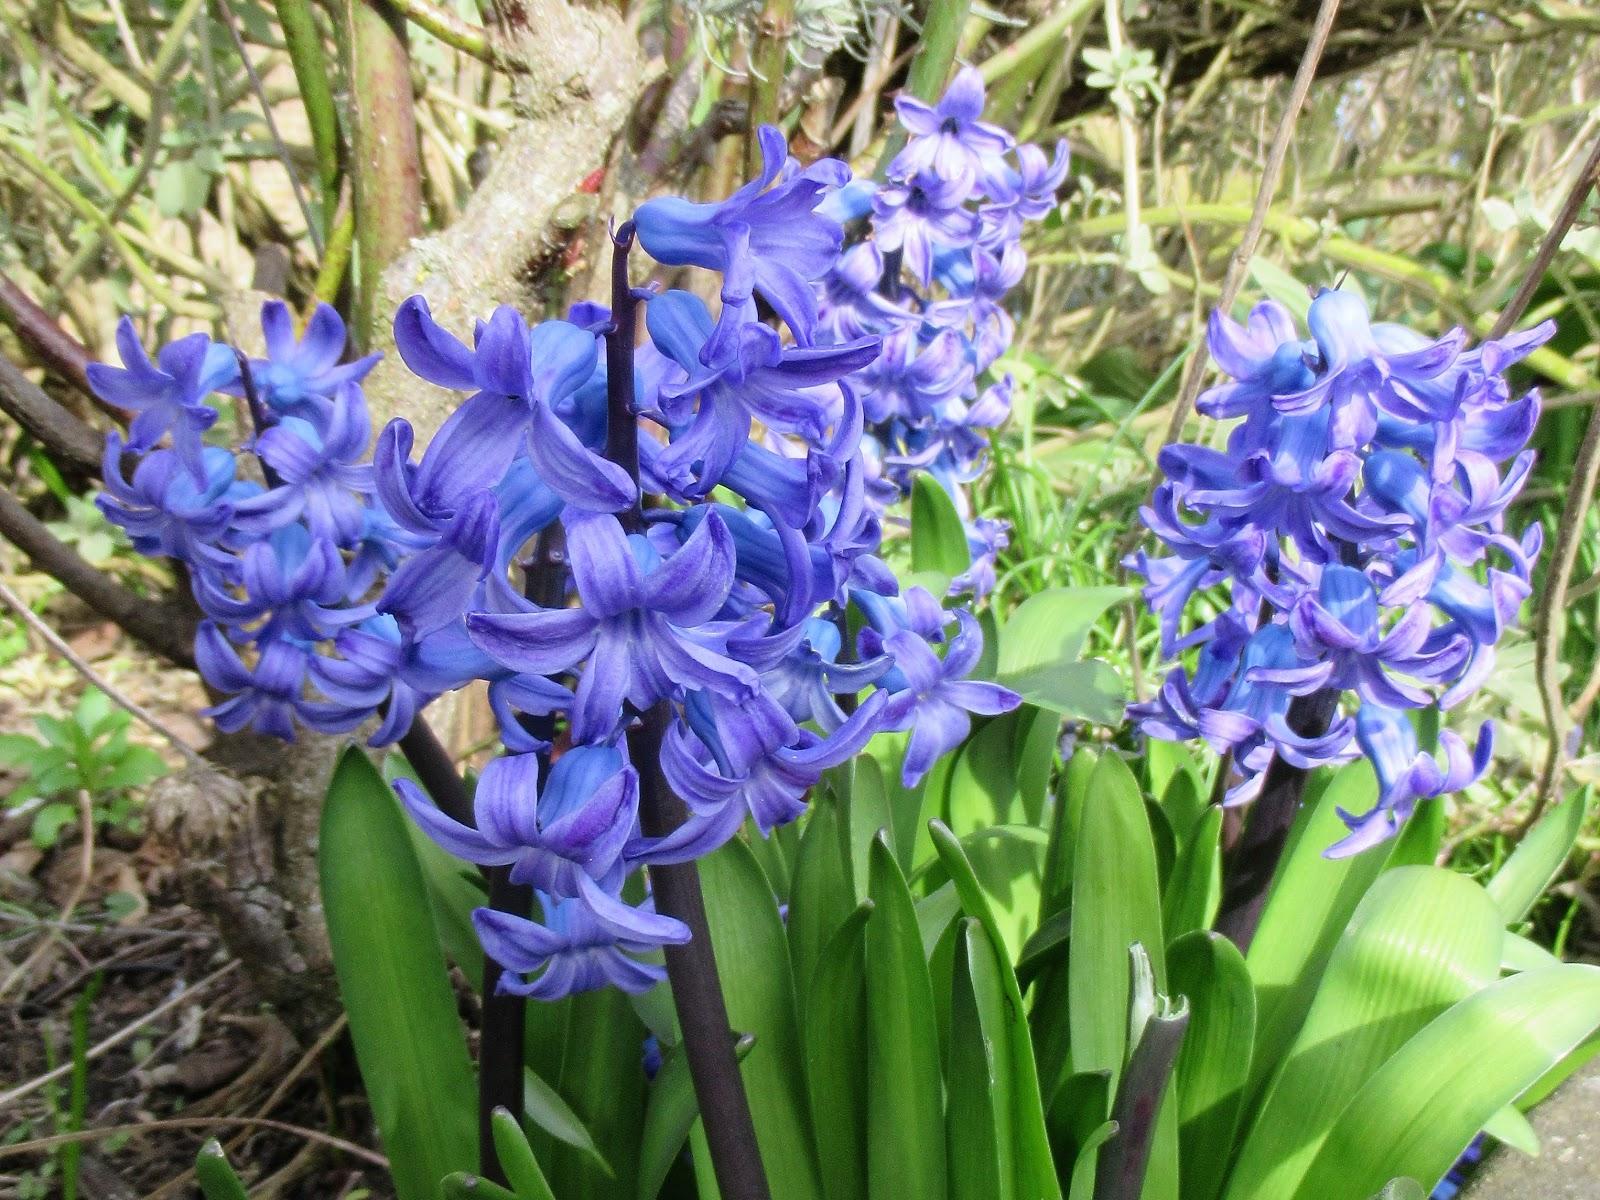 Martin Brookes Oakham Rutland England Spring Flowers Bluebells And